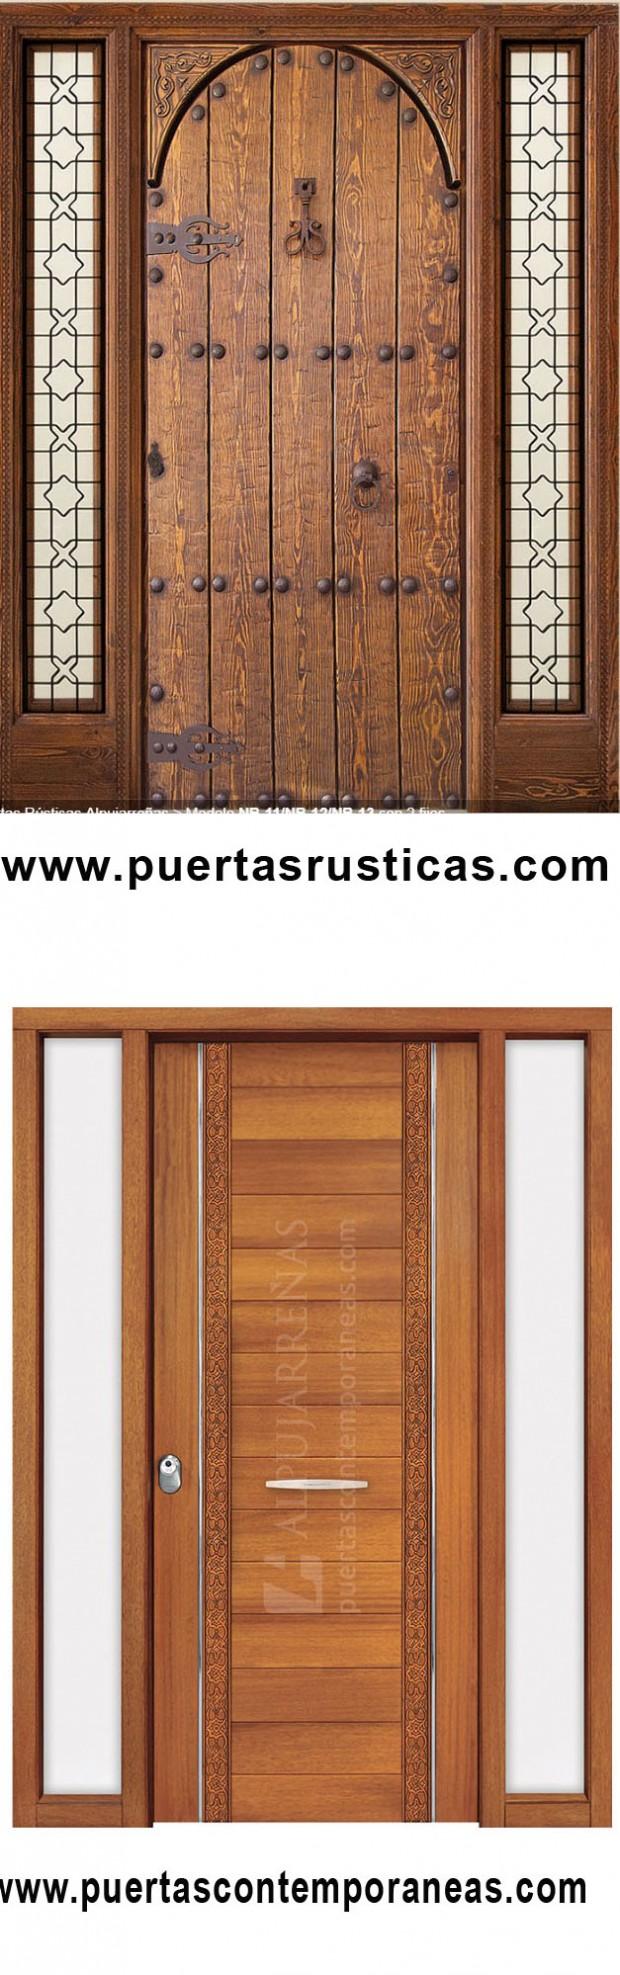 www.derribossales.com distribuidor de www.puertasrusticas.com